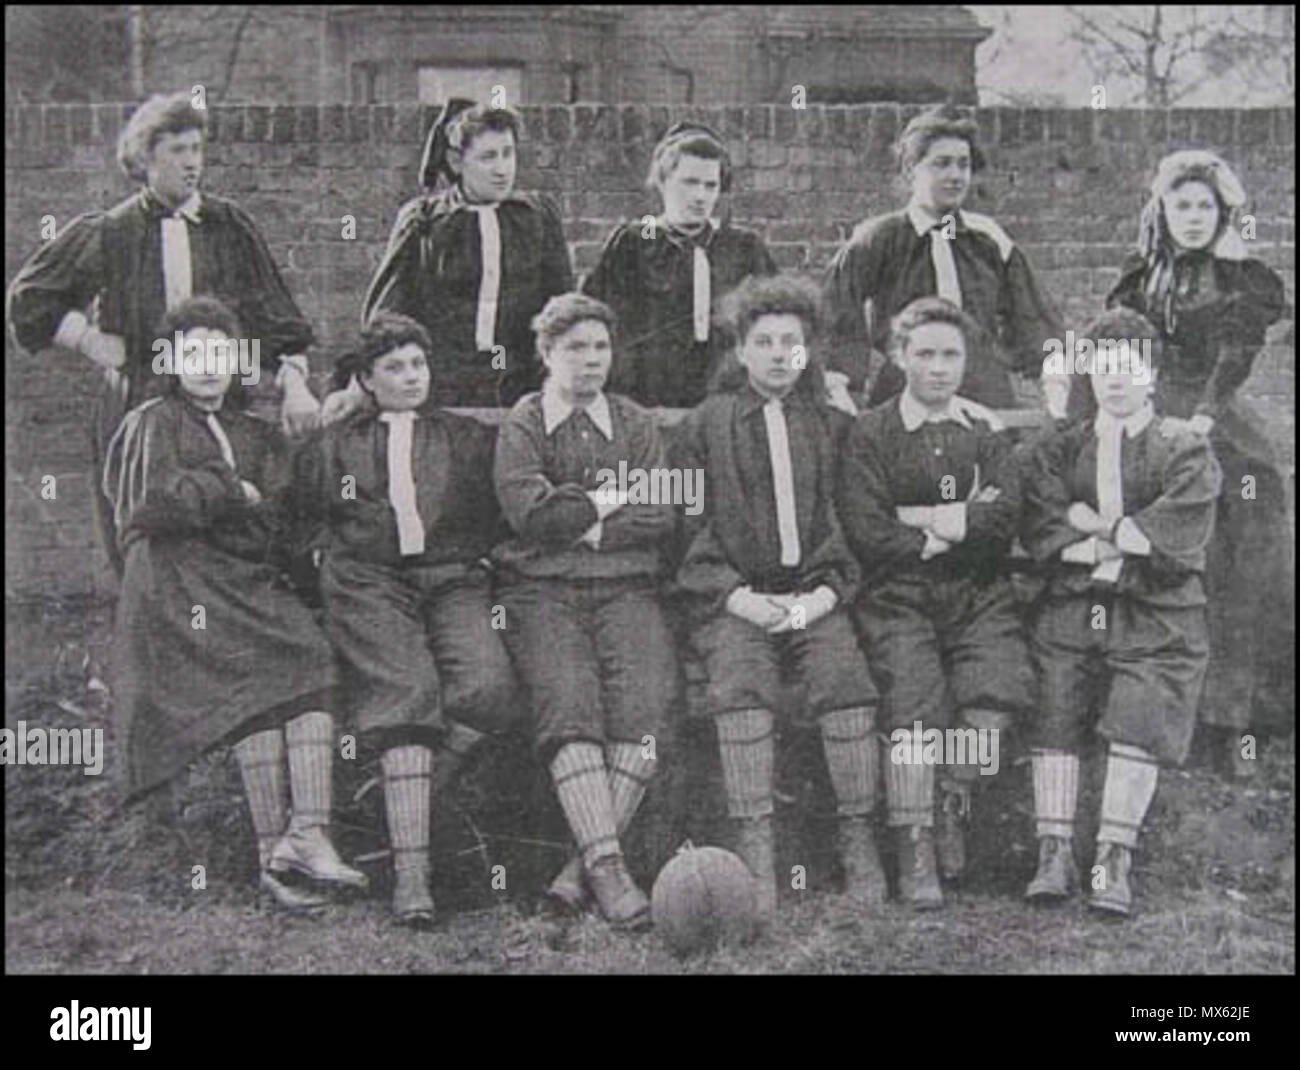 . L'équipe de North London, le 23 mars 1895. Debout: Lily Lynn, Nettie Honeyball, Williams, Edwards, Ide. Assises: Compton, F. B. Fenn, Nellie Gilbert, P. Smith, Rosa Thiere, Biggs. 1895. Unknown 99 British Ladies Football Club - Stock Image